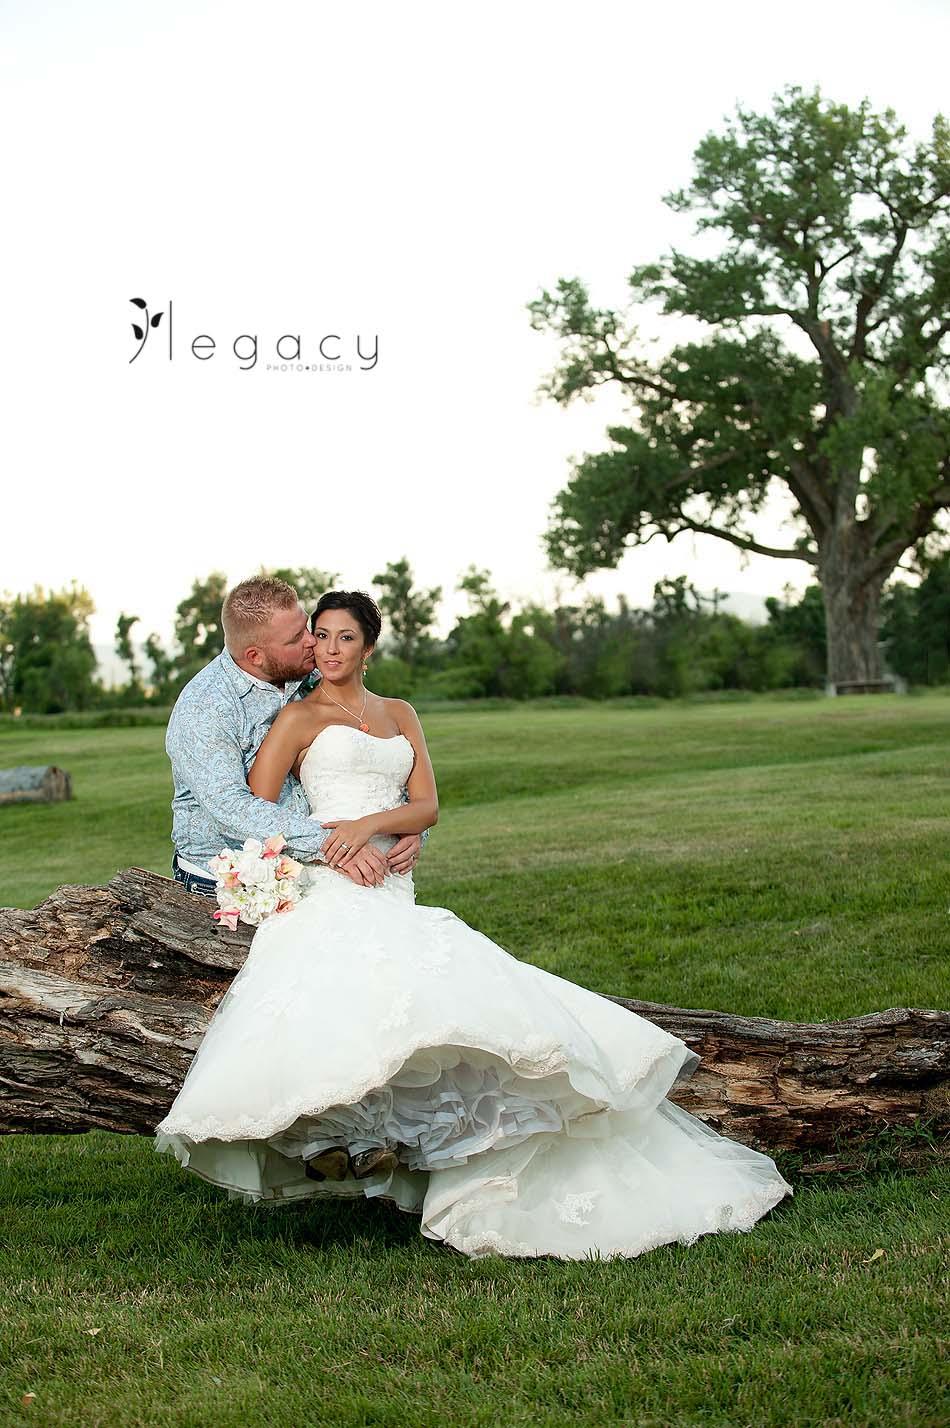 Wedding Dresses Rapid City Sd | Wedding Tips and Inspiration